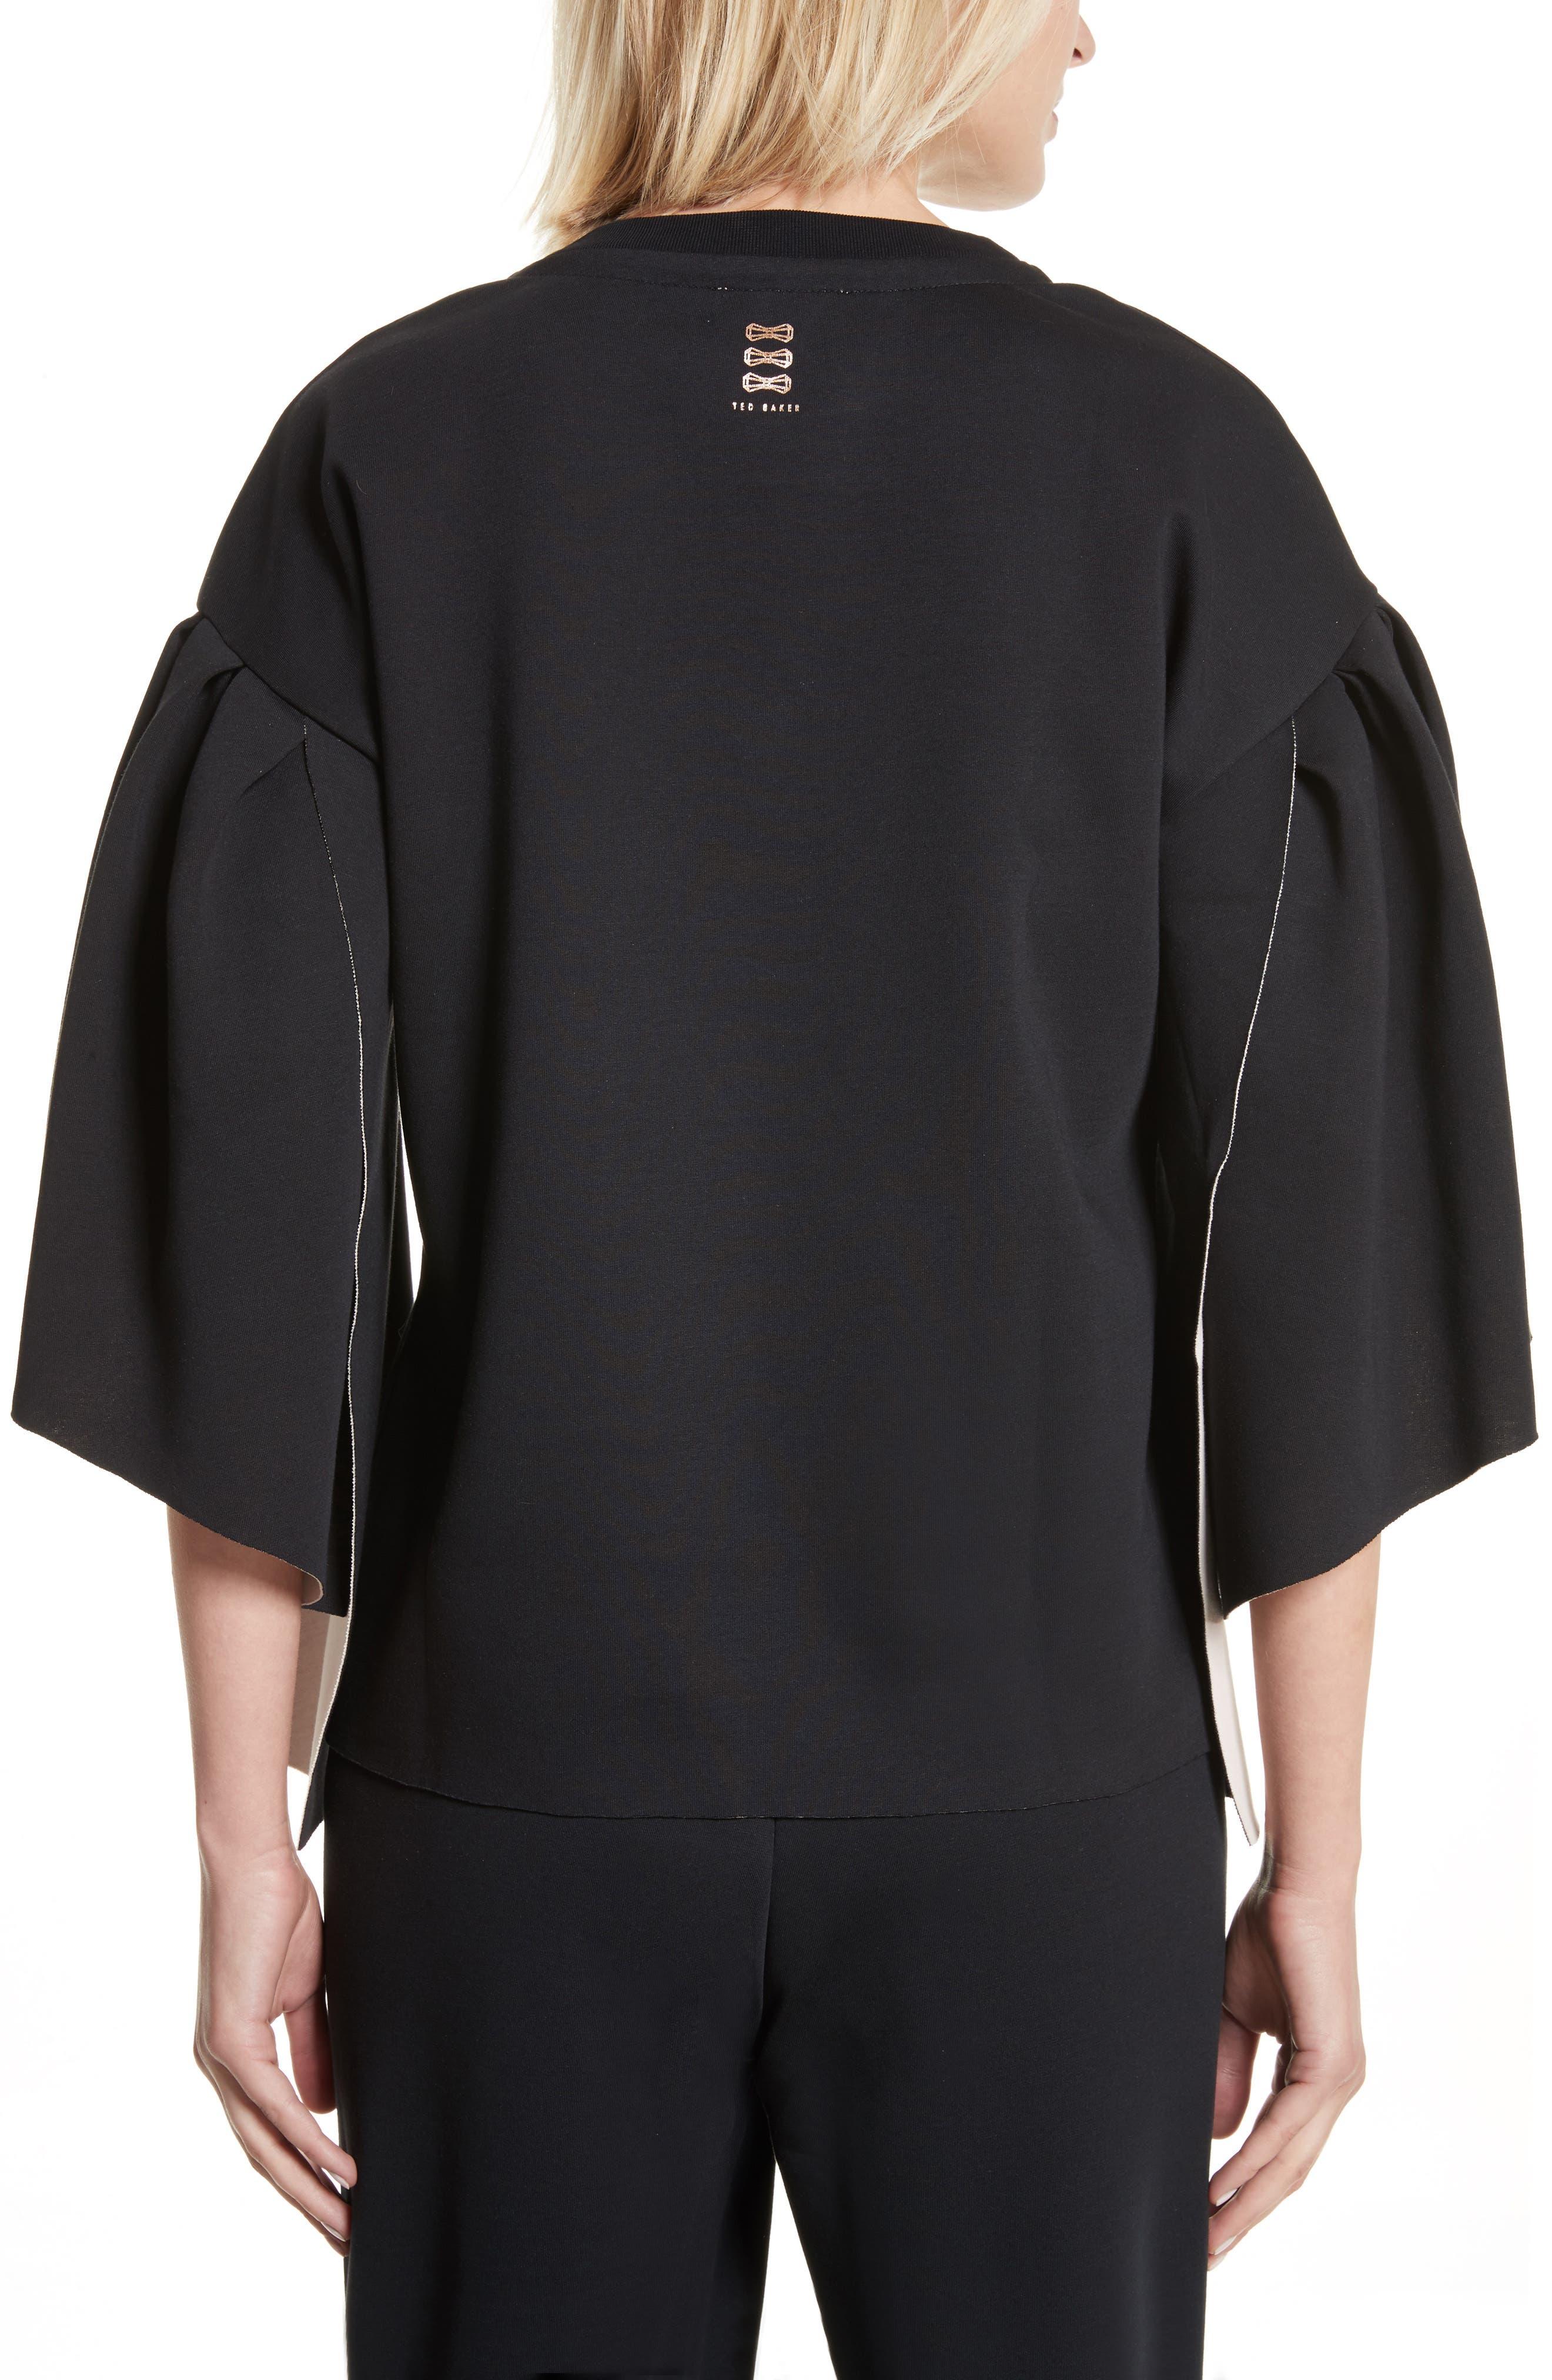 Orcher Full Sleeve Sweatshirt,                             Alternate thumbnail 2, color,                             001